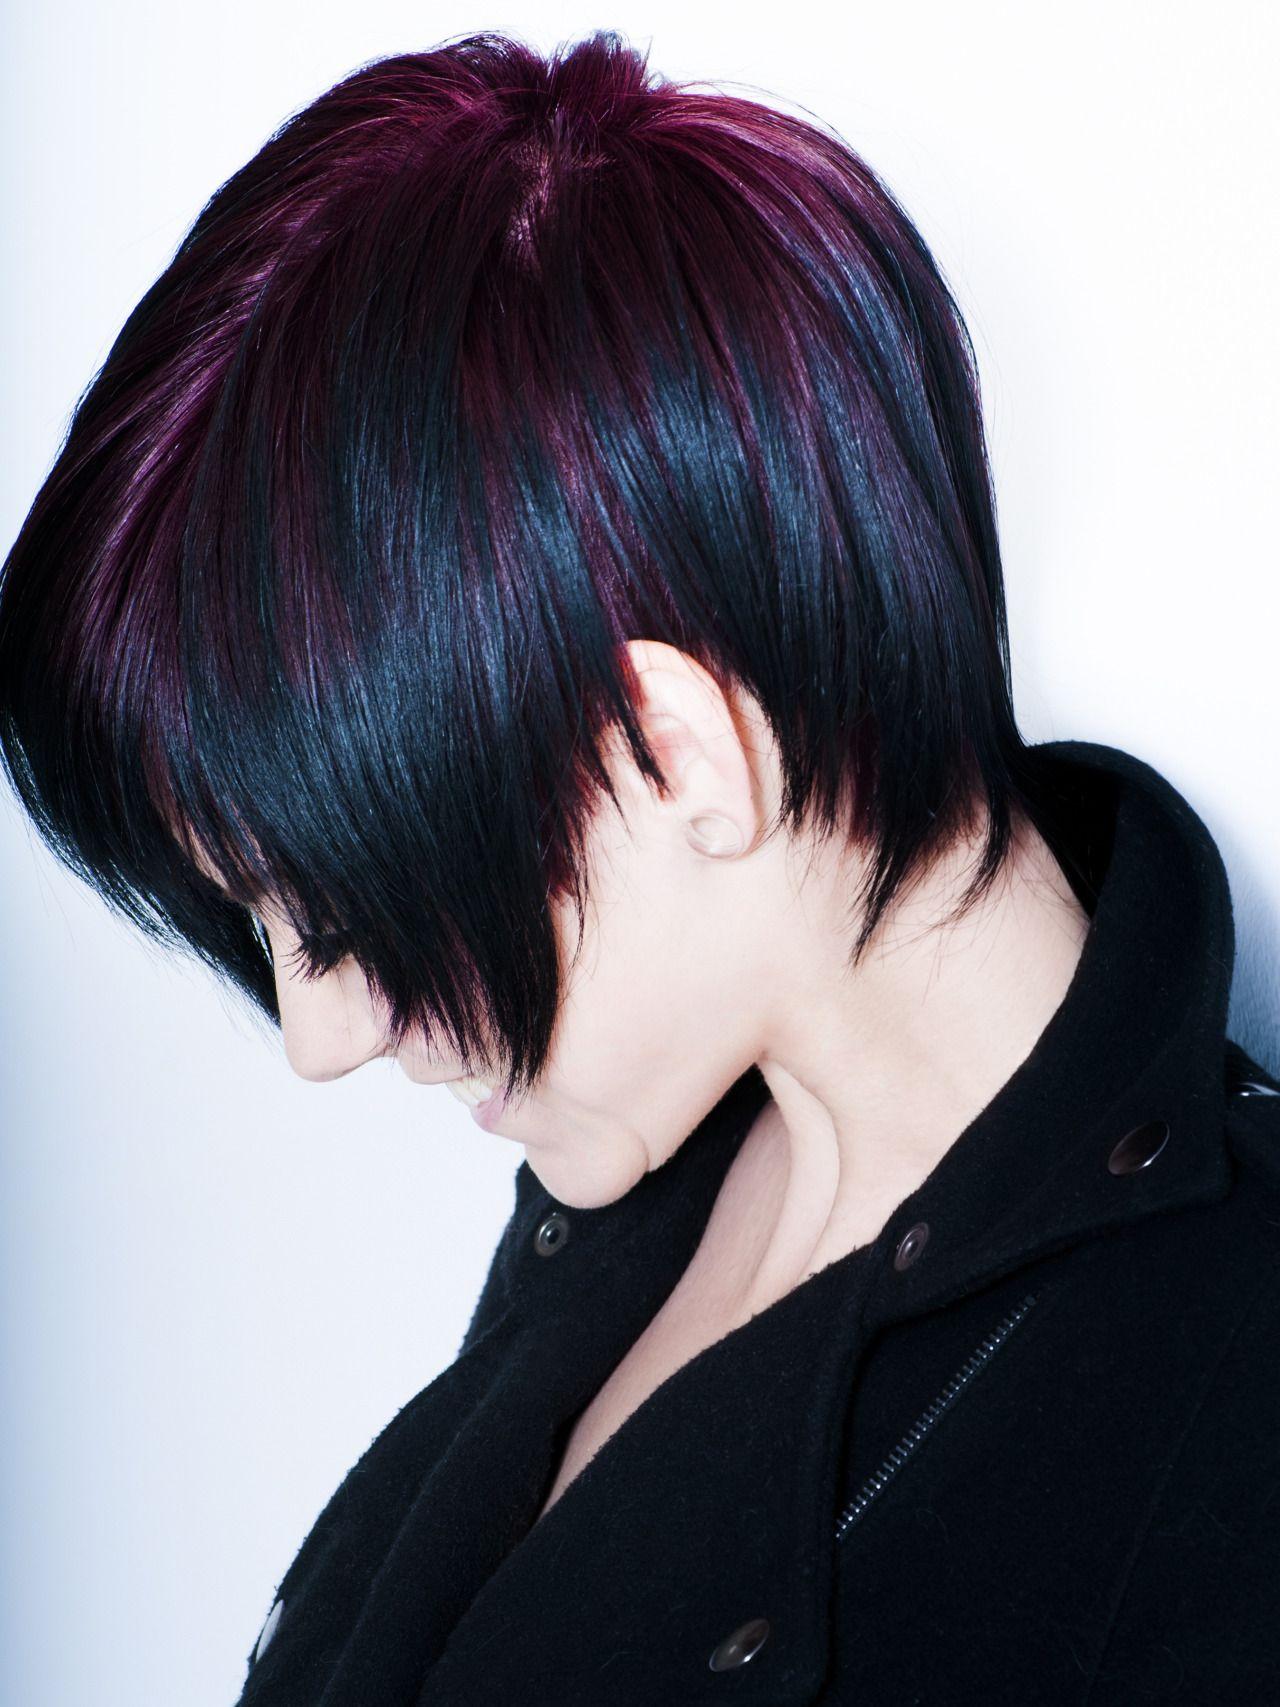 Hair for the free spirits amazing hair stuff pinterest black